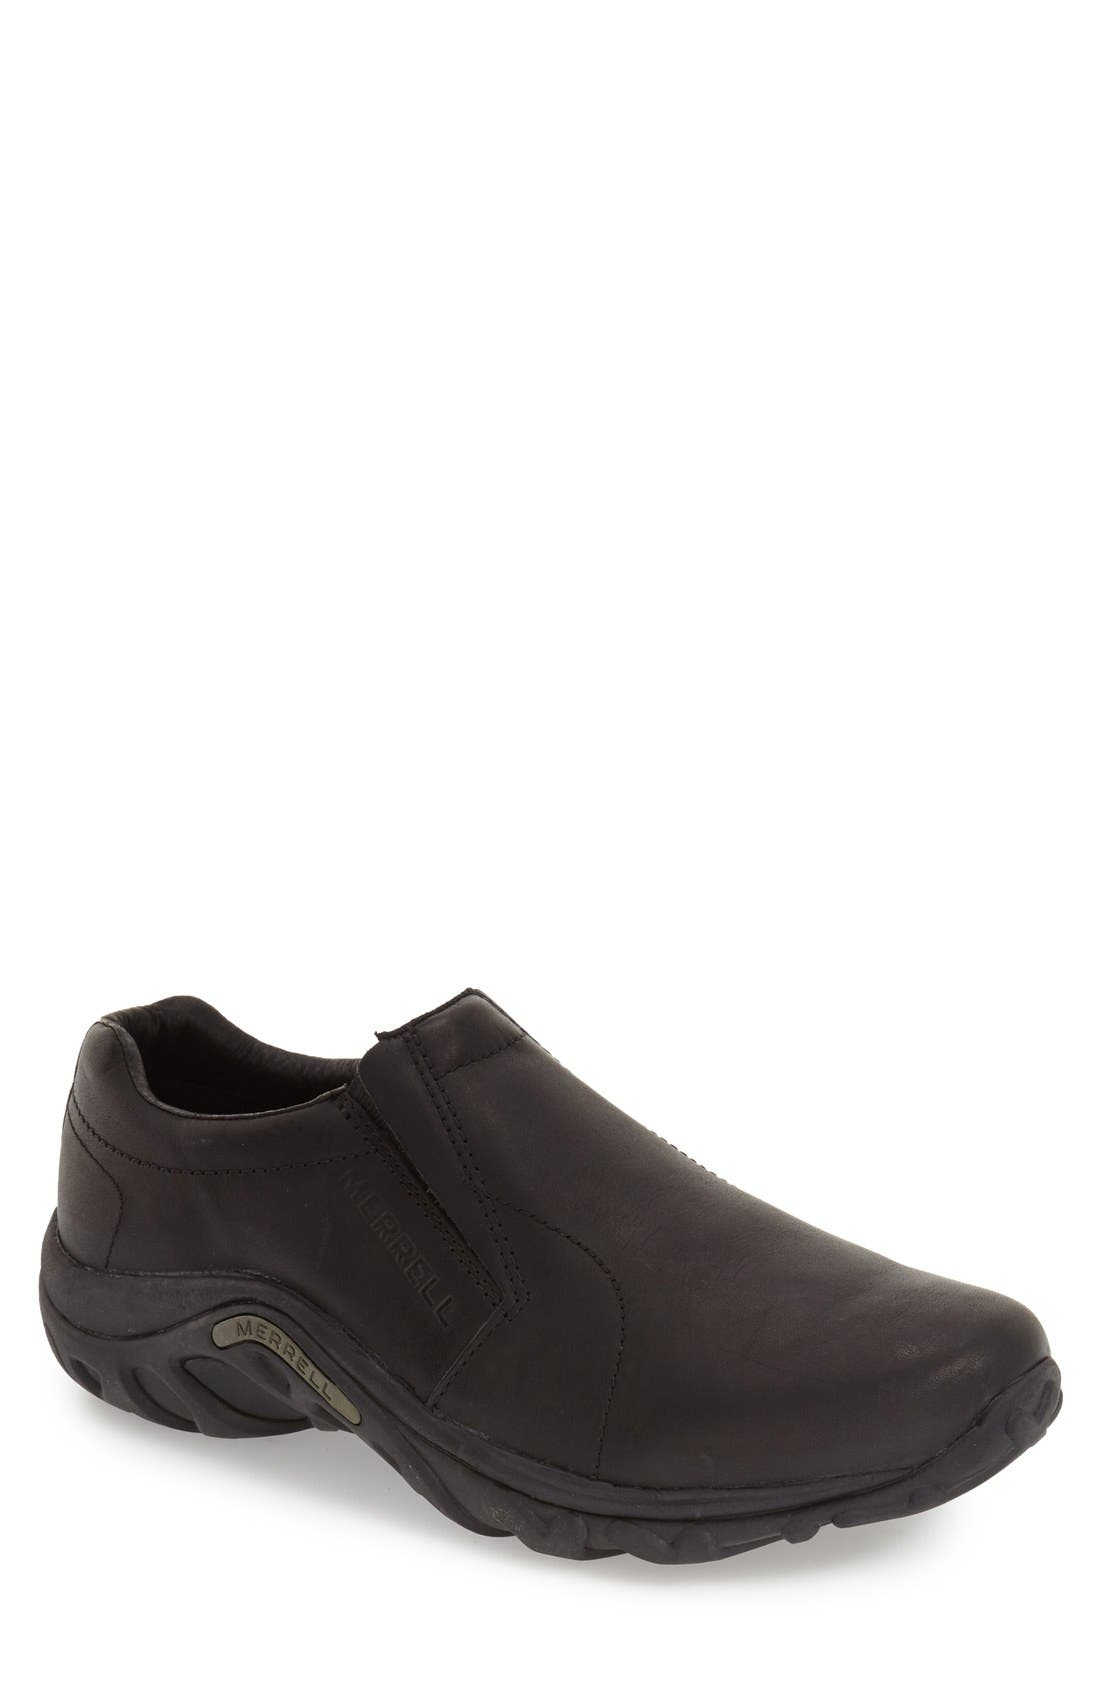 MERRELL 'Jungle Moc' Leather Athletic Slip-On, Main, color, BLACK